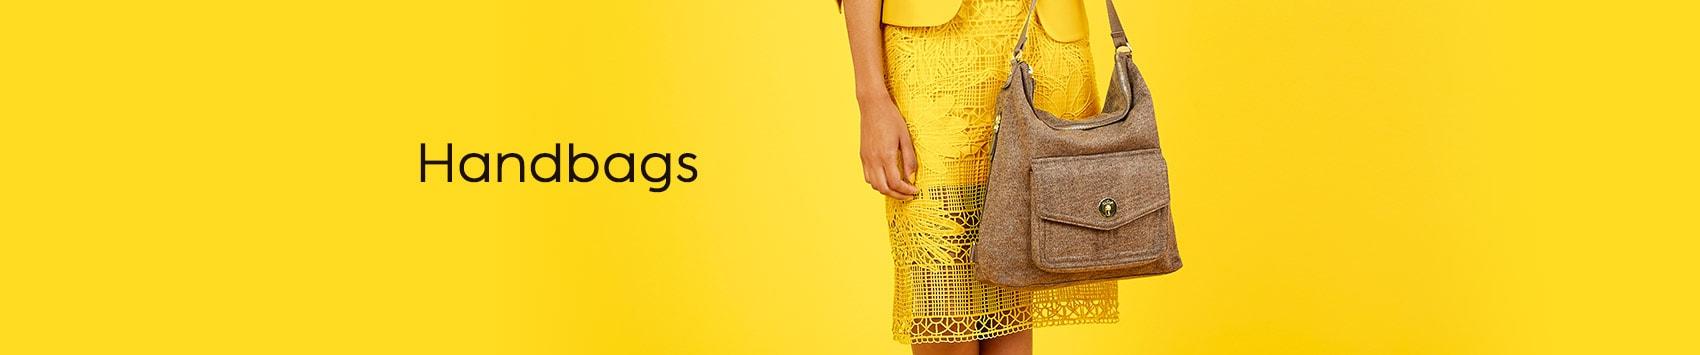 handbags banner